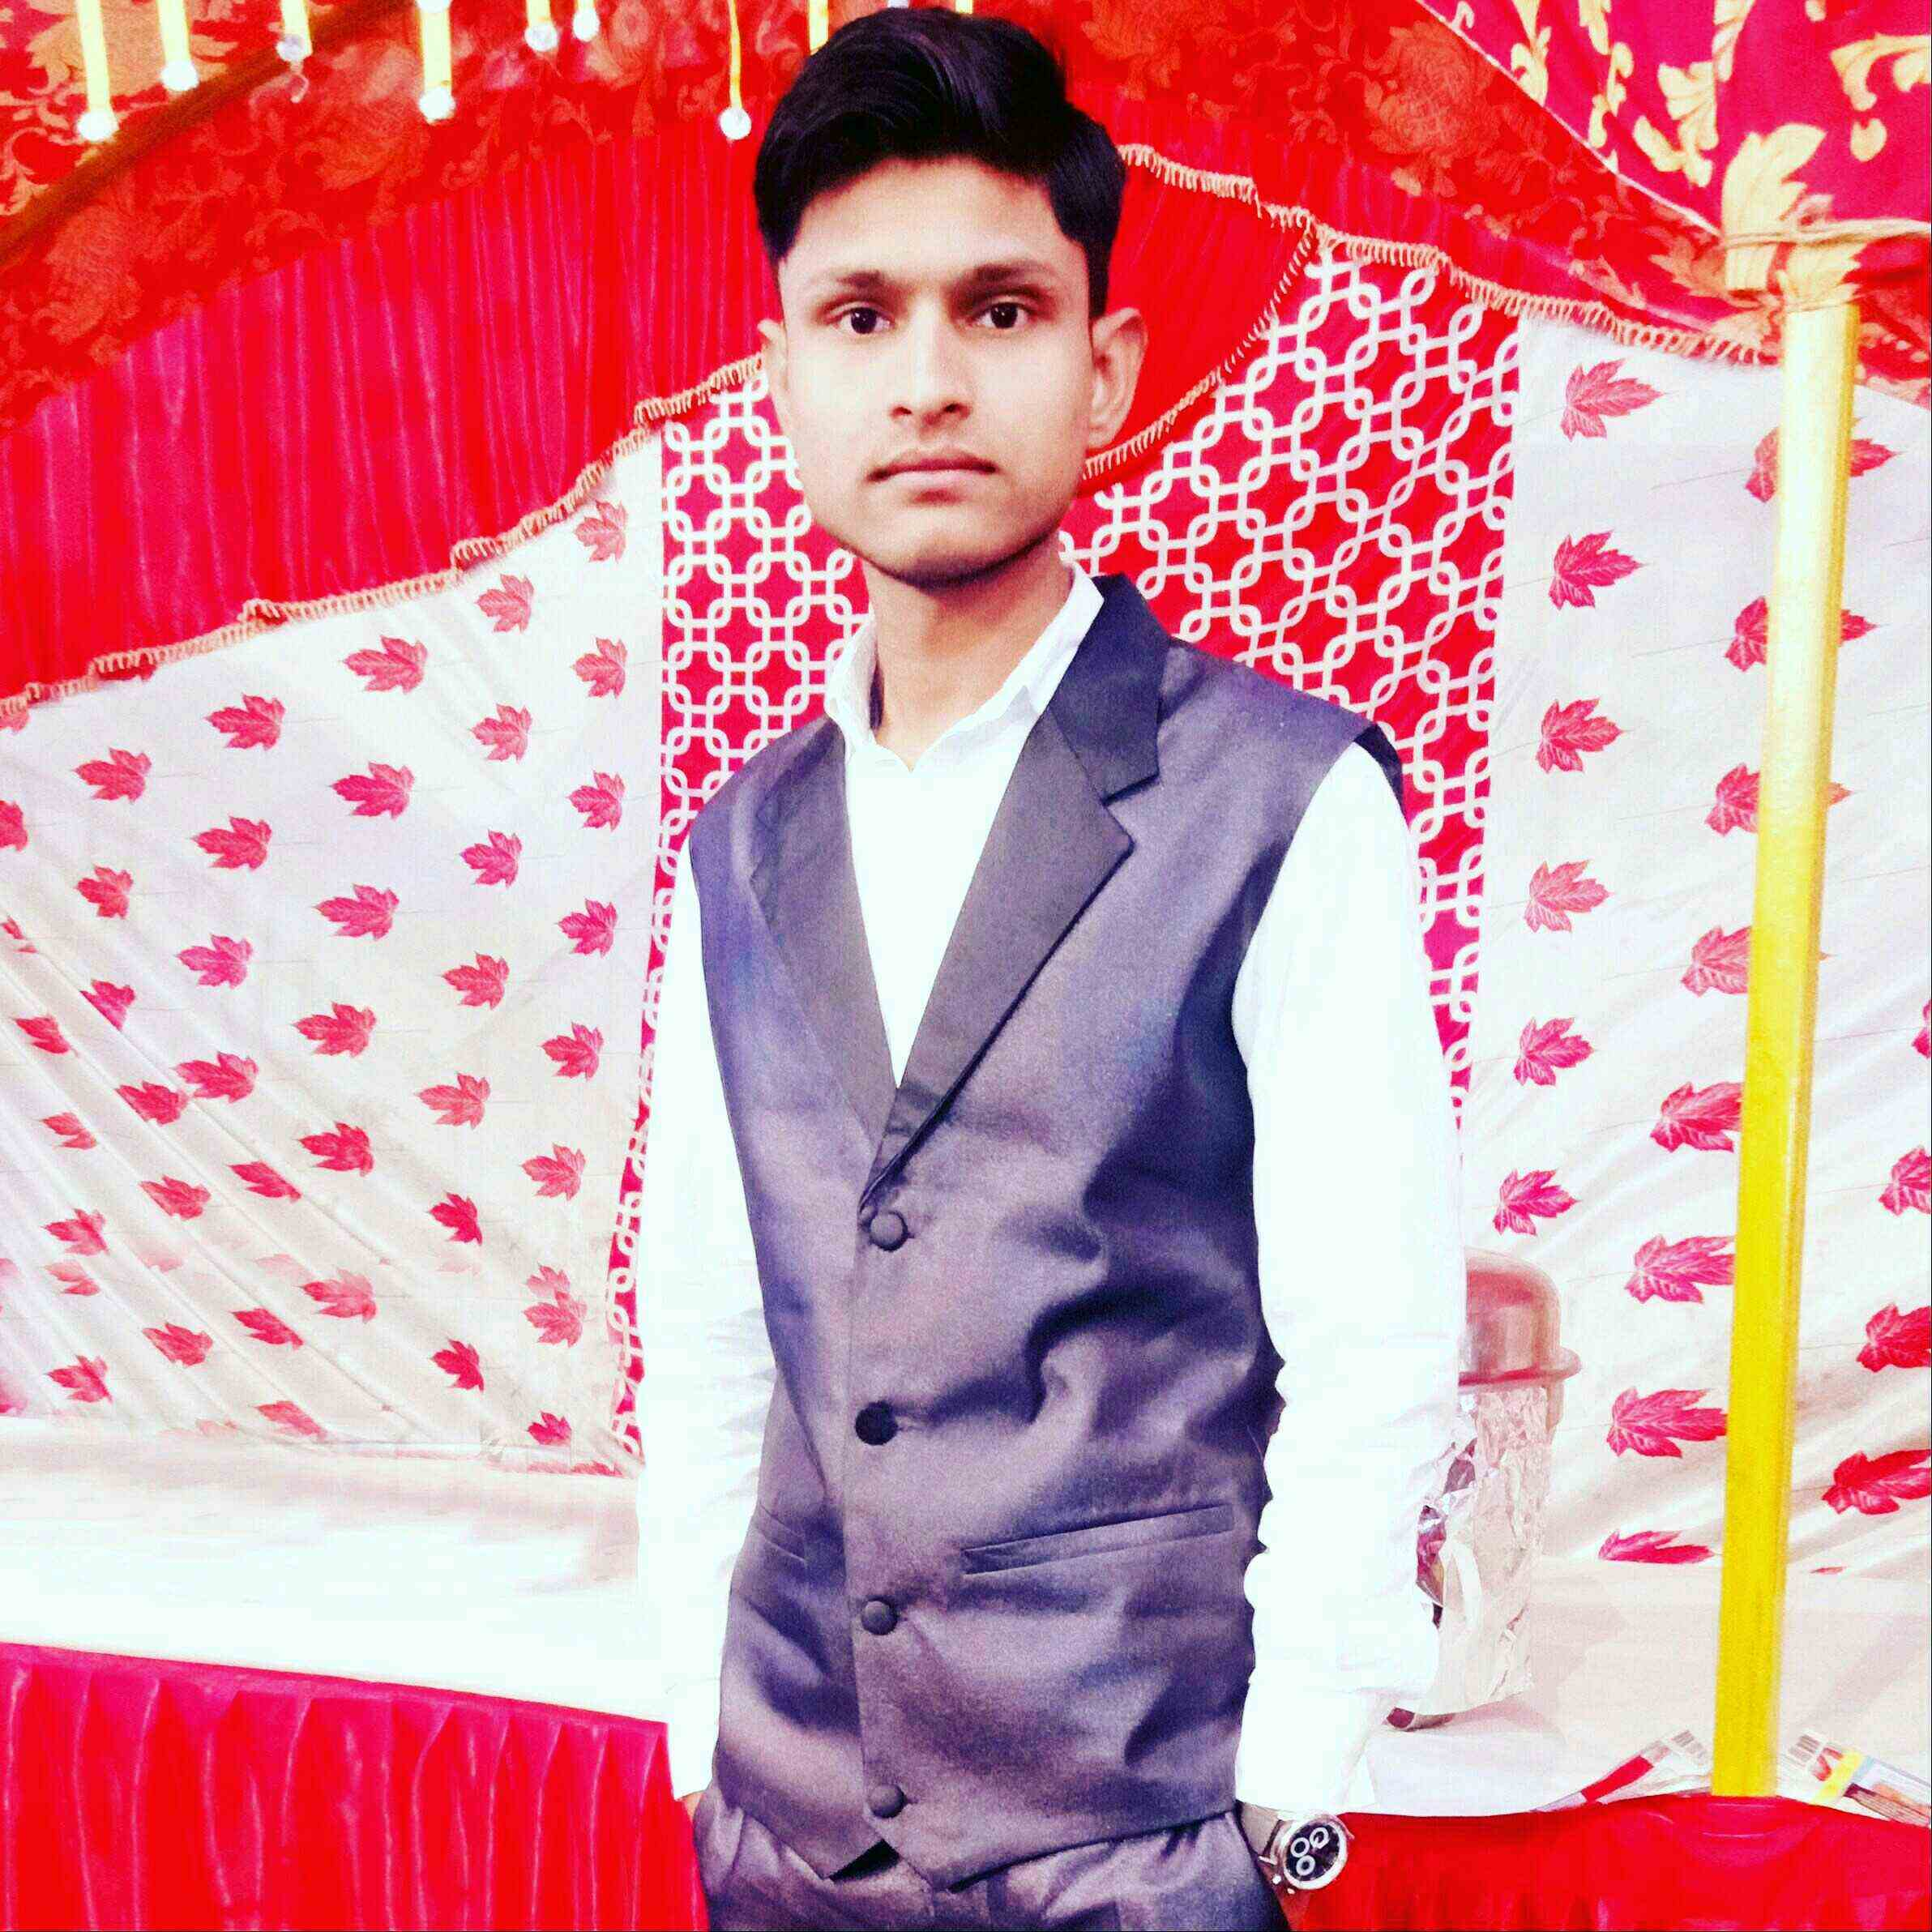 Mukabbir Ahmad Dunia main, Hain meer or Ghalib se sukhanbar bhot acche...Chahat hai humara naam bhi ho shamil unhi